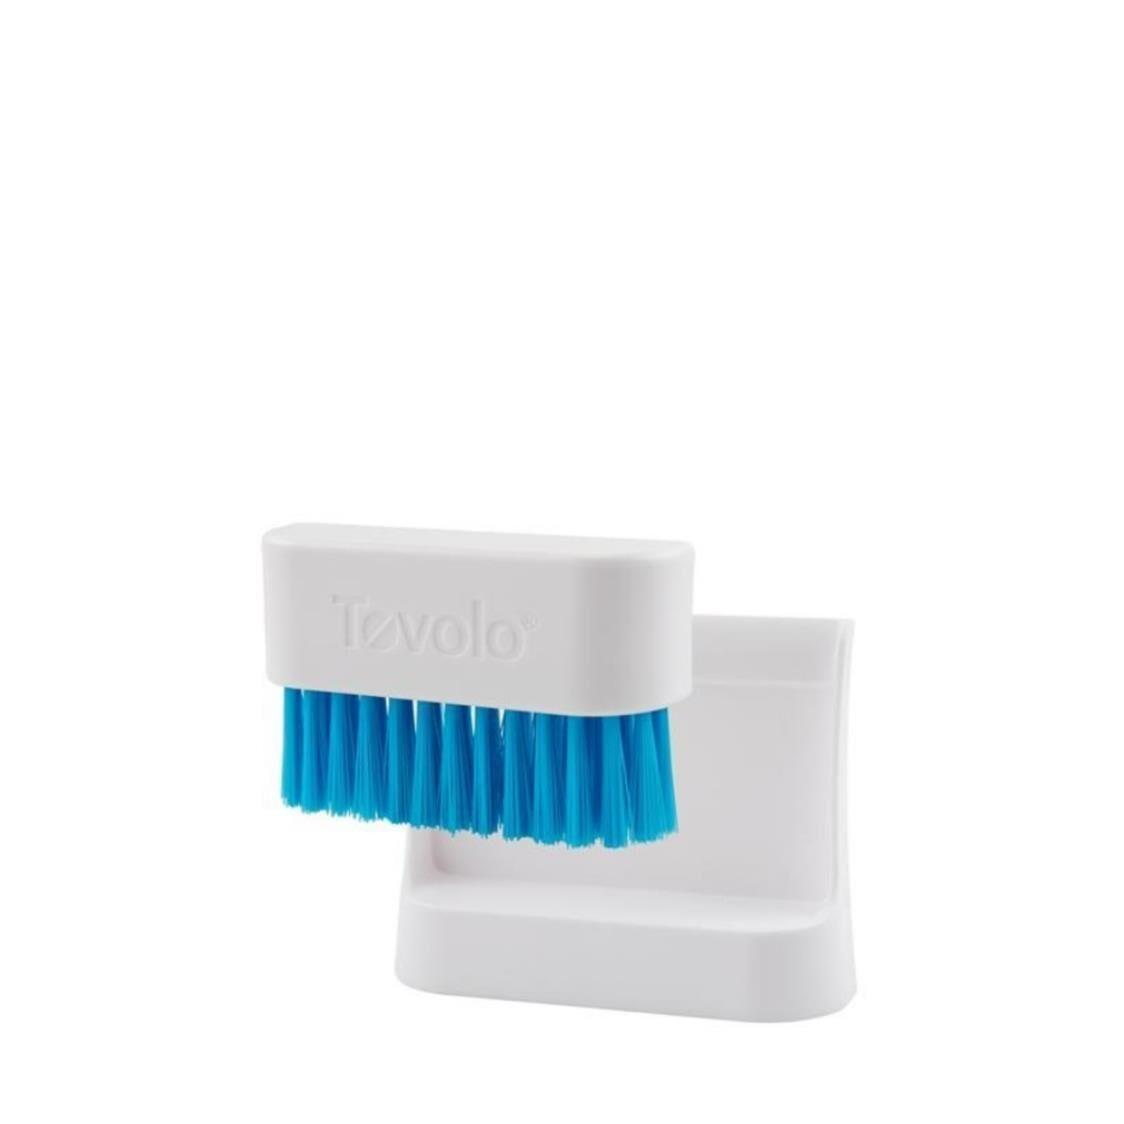 Tovolo Magnetic Countertop Brush  Dustpan